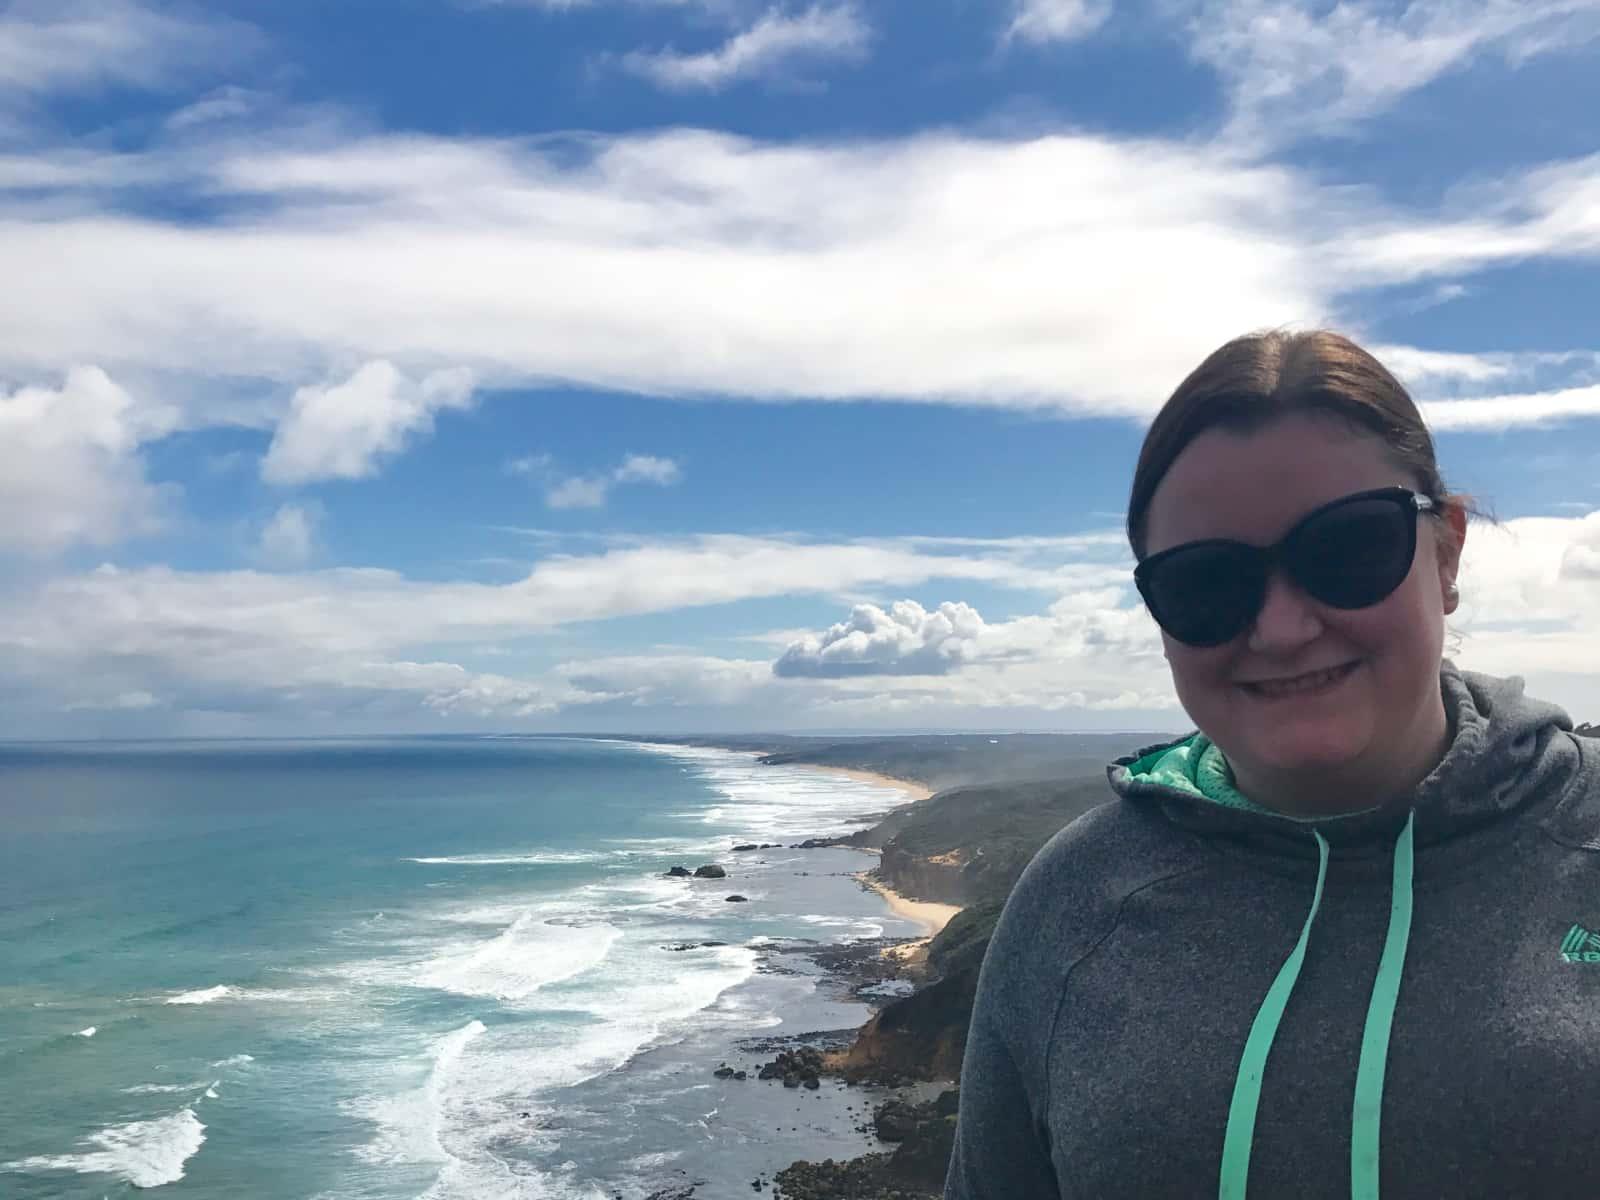 Cassandra from Canberra, Australian Capital Territory, Australia